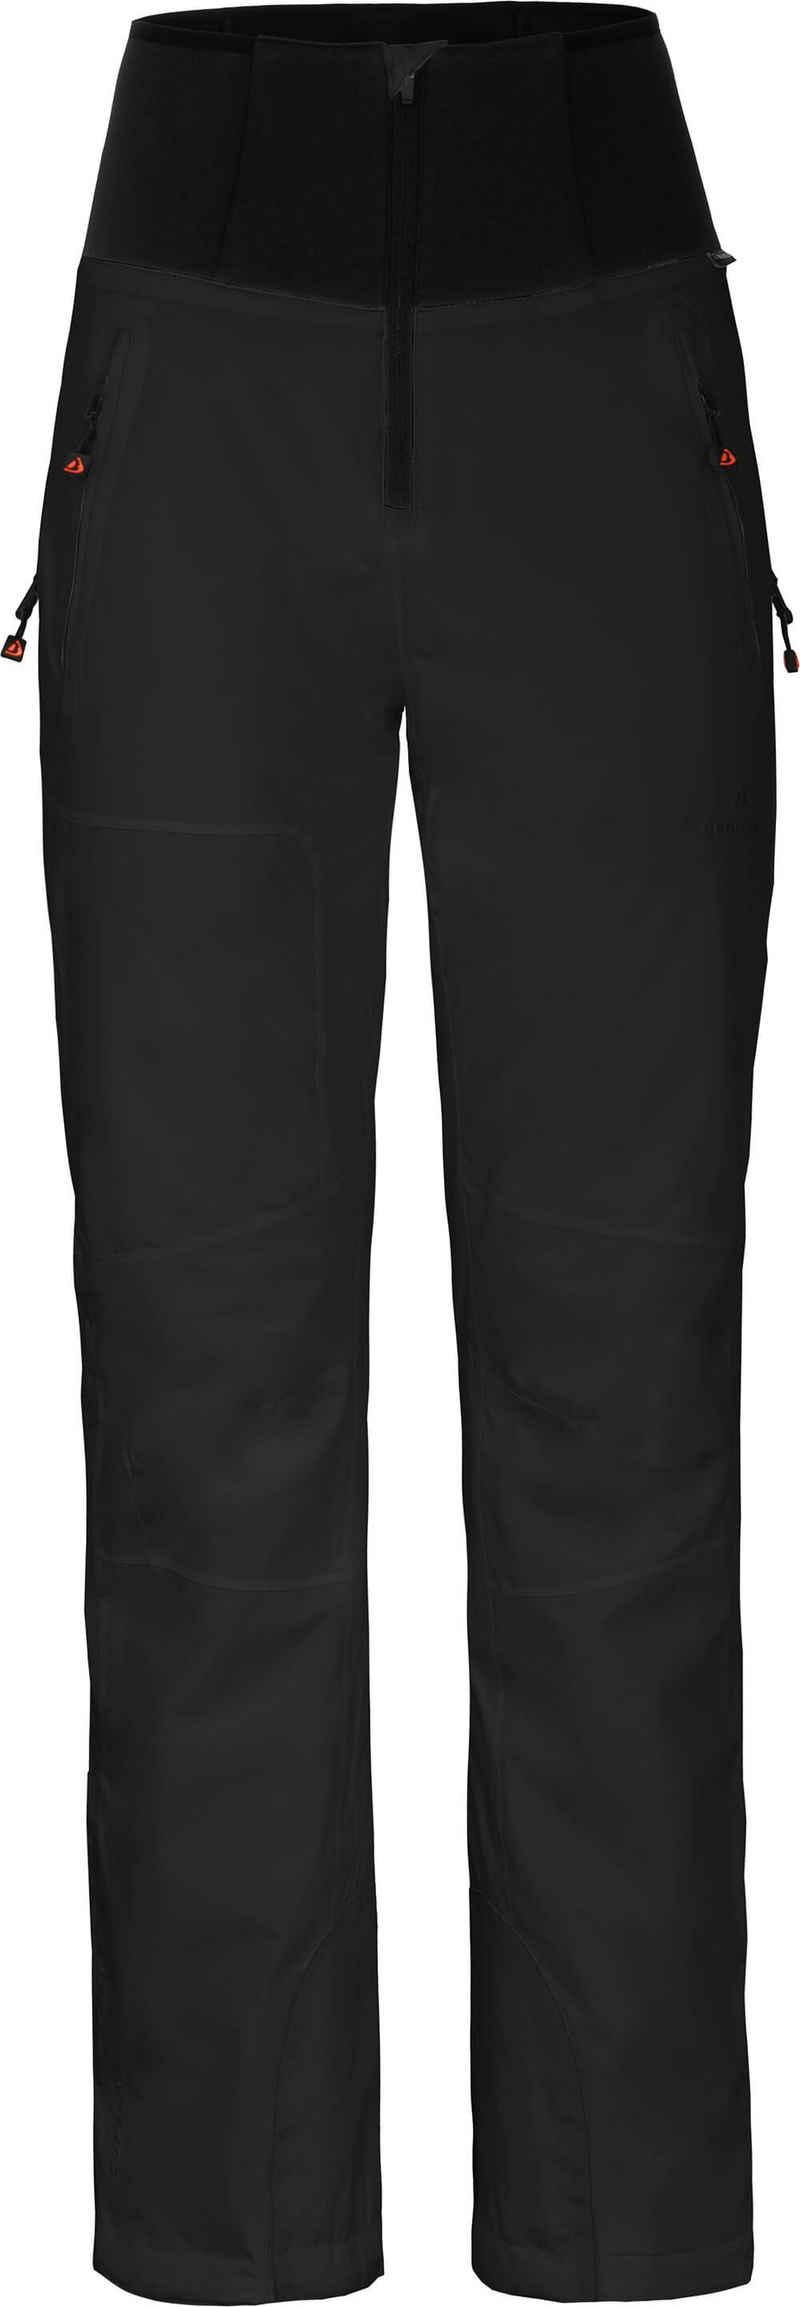 Bergson Skihose »MIEN Slim« Damen Skihose, wattiert, 20000 mm Wassersäule, Kurzgrößen, schwarz